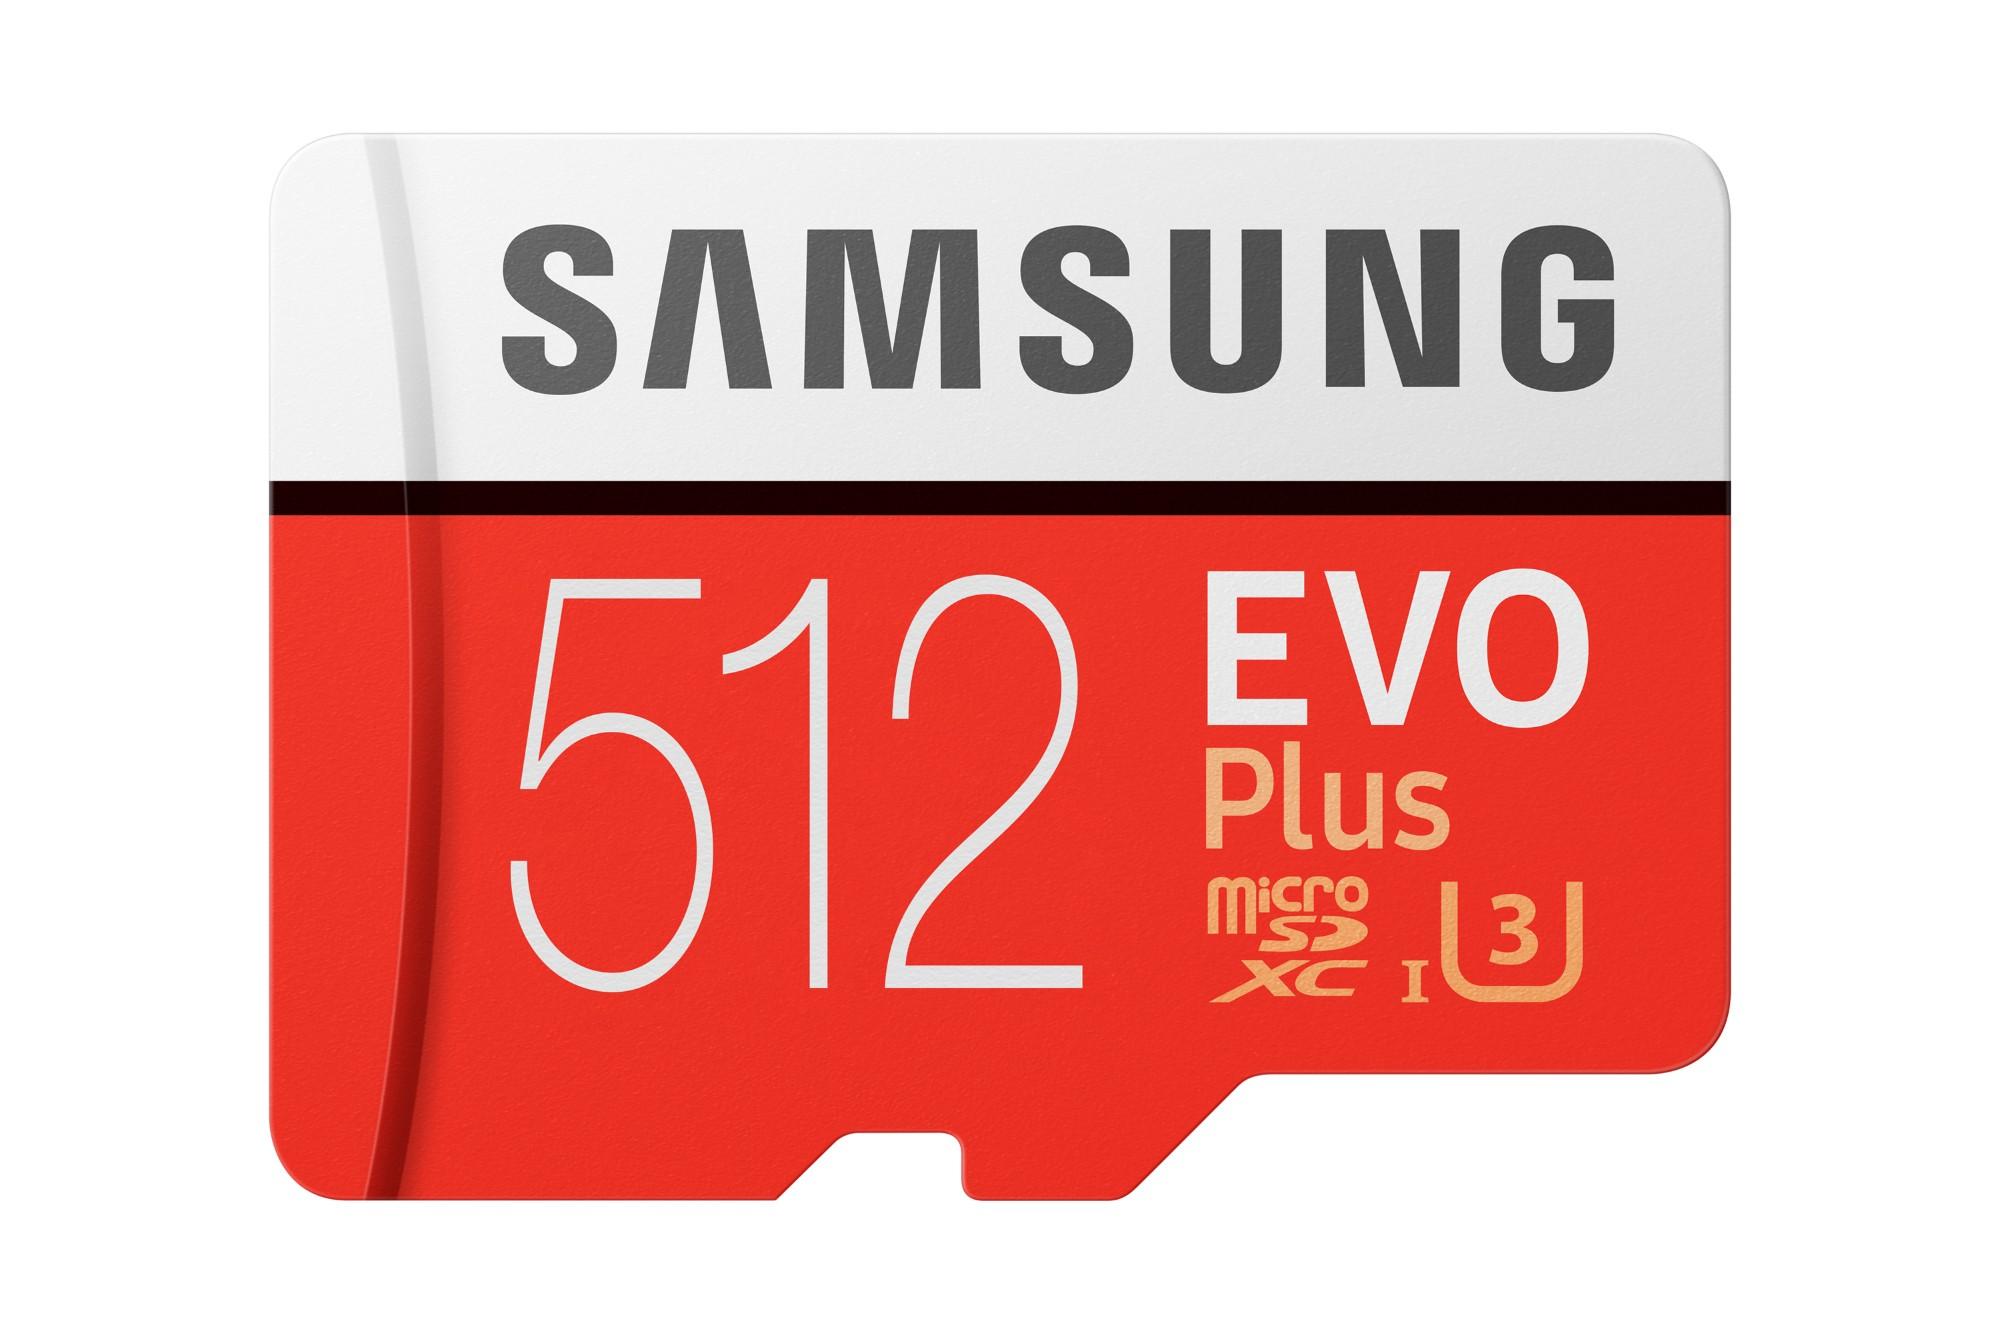 Samsung Evo Plus memoria flash 512 GB MicroSDXC Clase 10 UHS-I